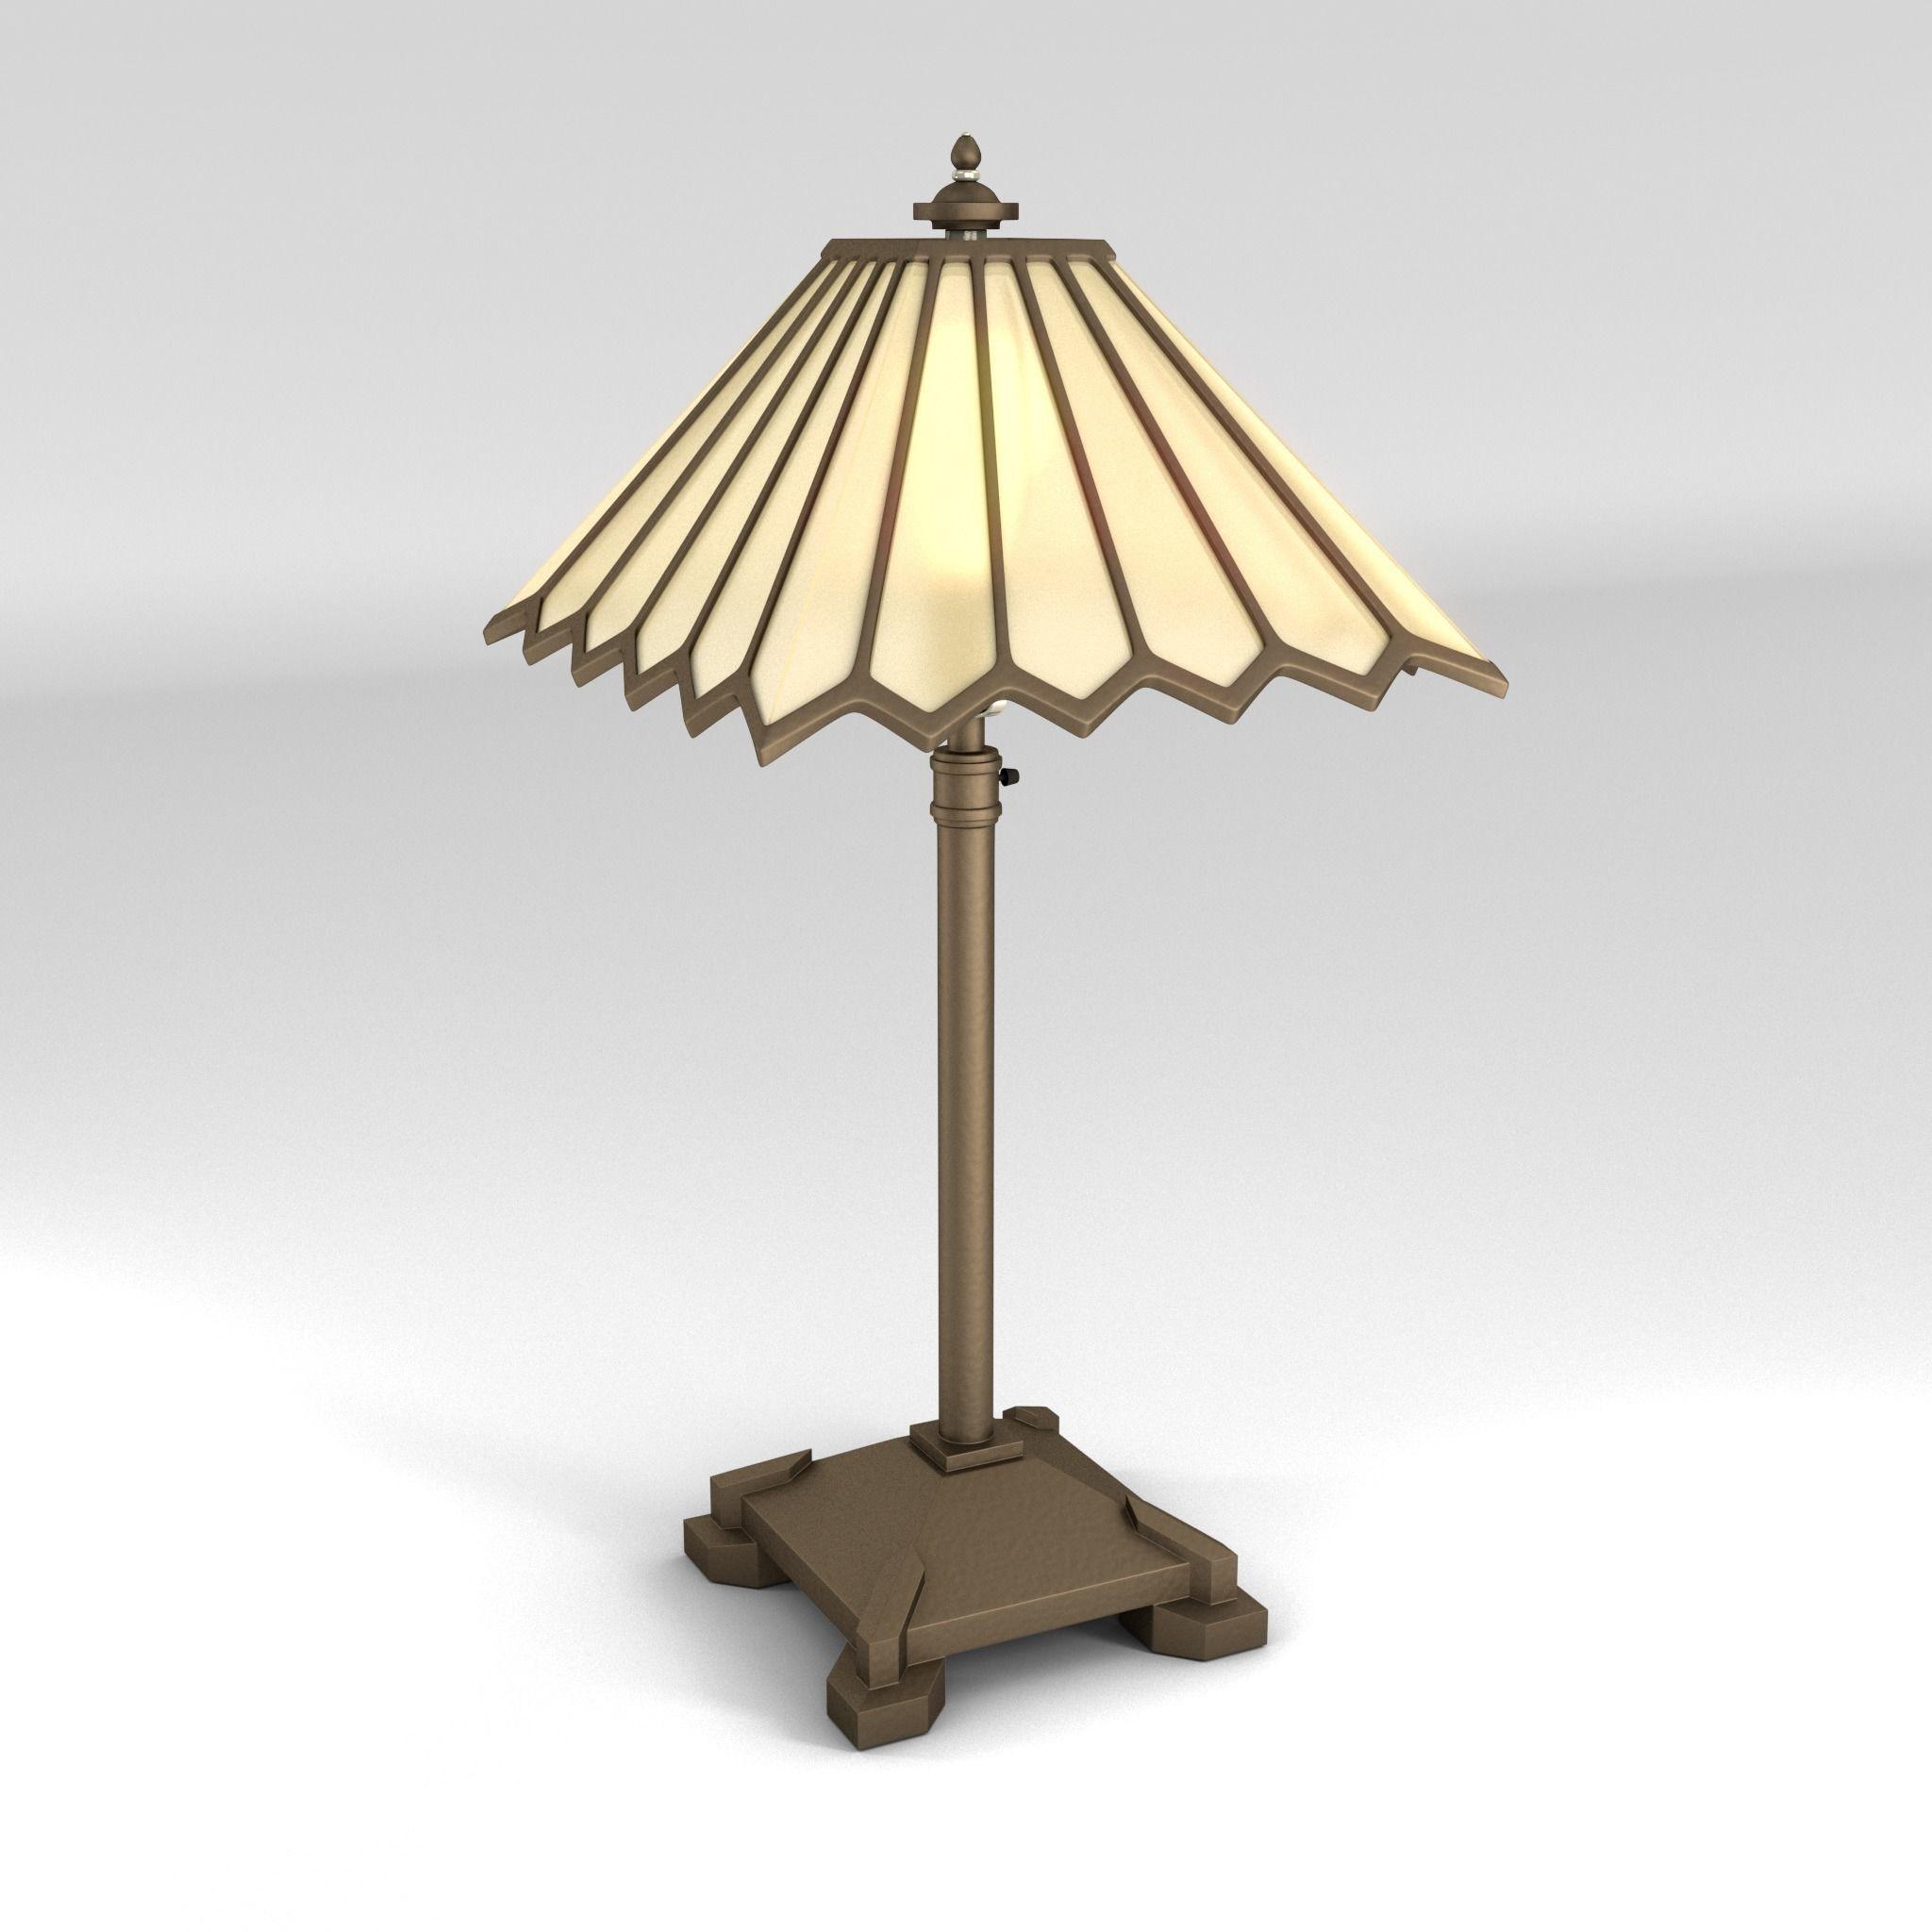 art deco lamp. Art Deco Lamp 1 3d Model Obj Fbx Ma Mb I